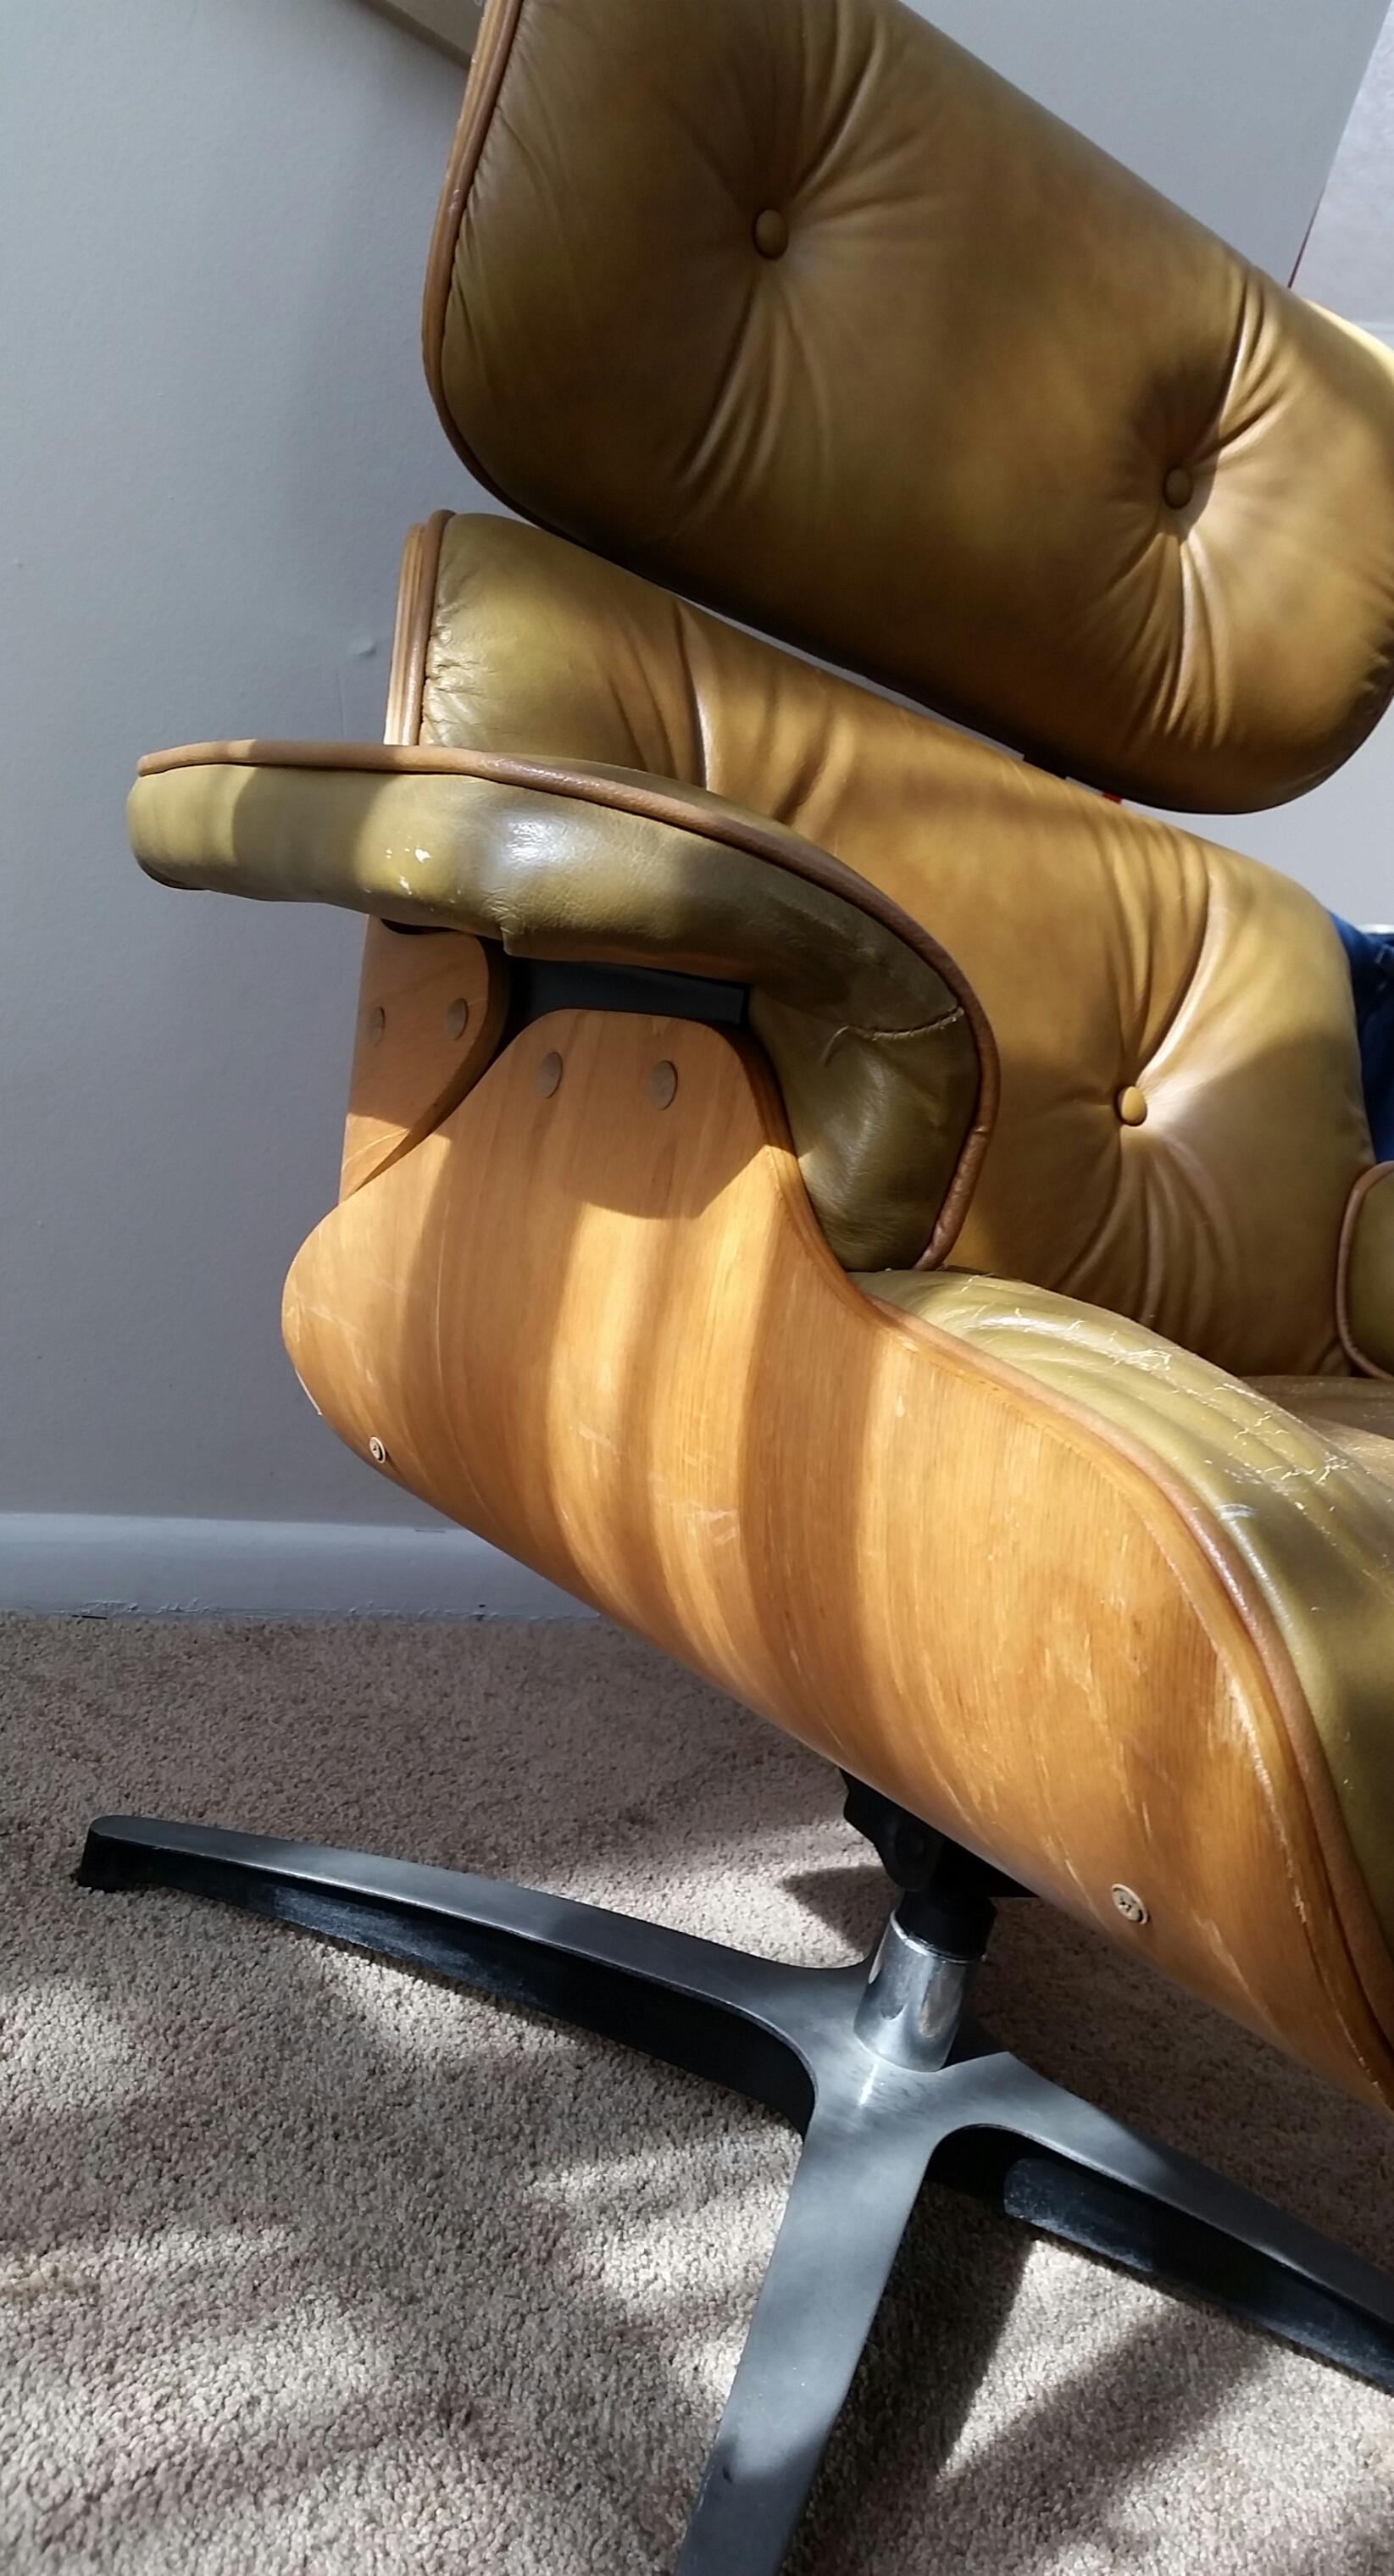 Metal chair feet clips - Pic 3